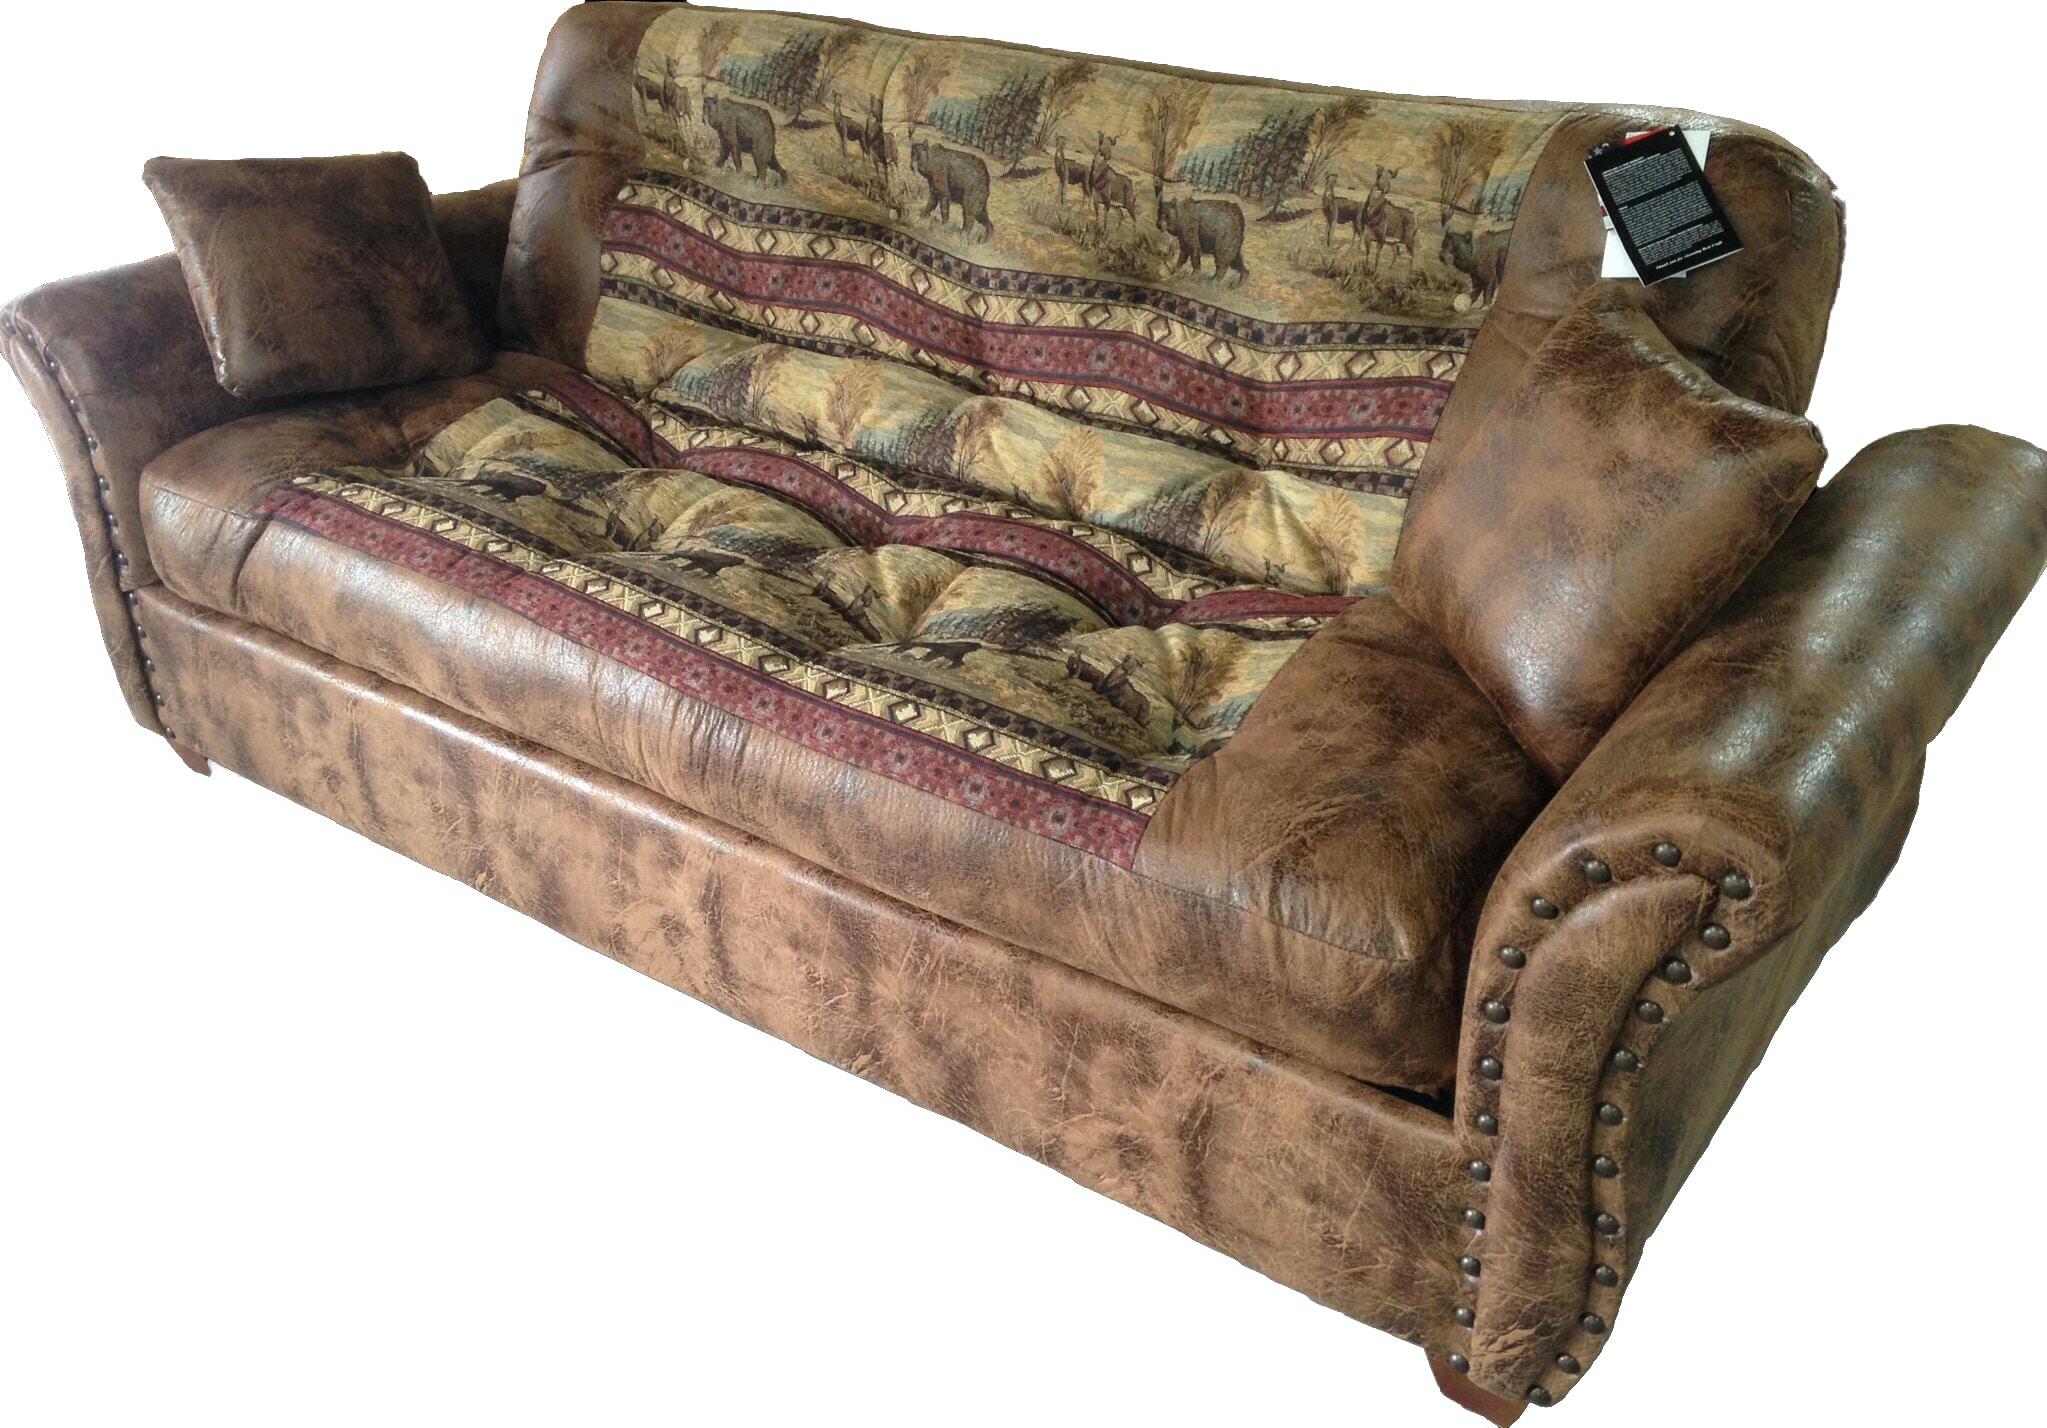 tampa futon sofa bed mackenzie dog rustic